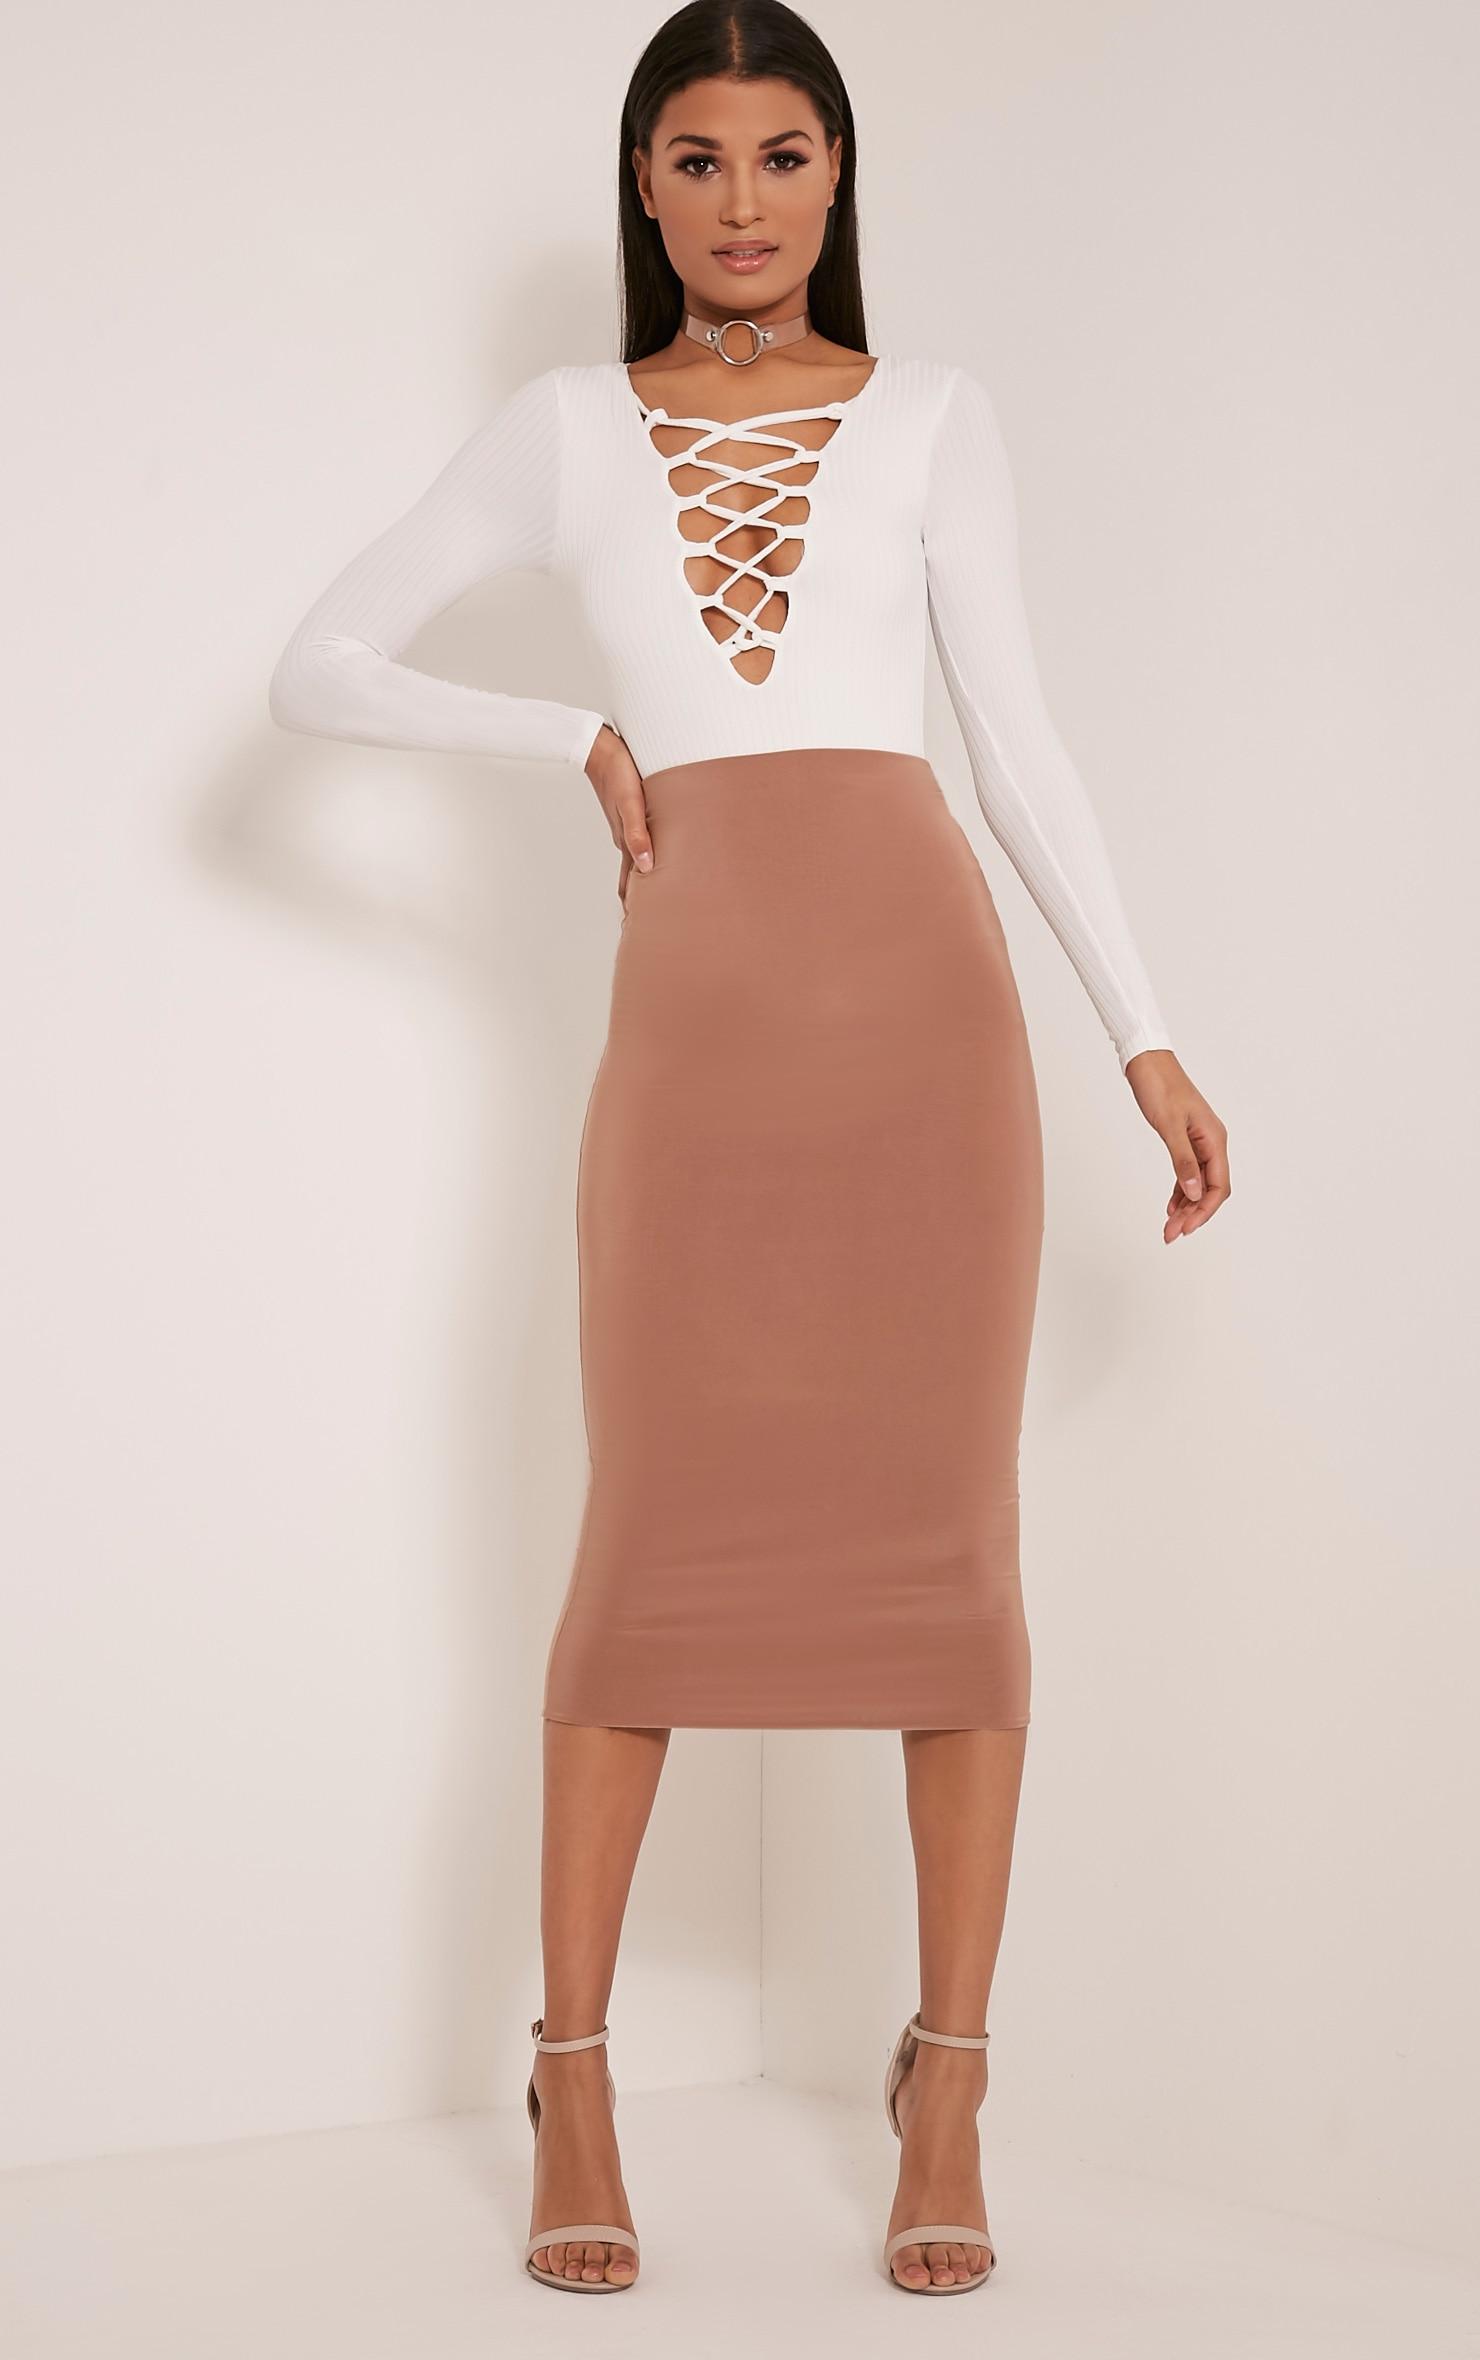 Baylee White Lace Up Ribbed Long Sleeve Bodysuit 6